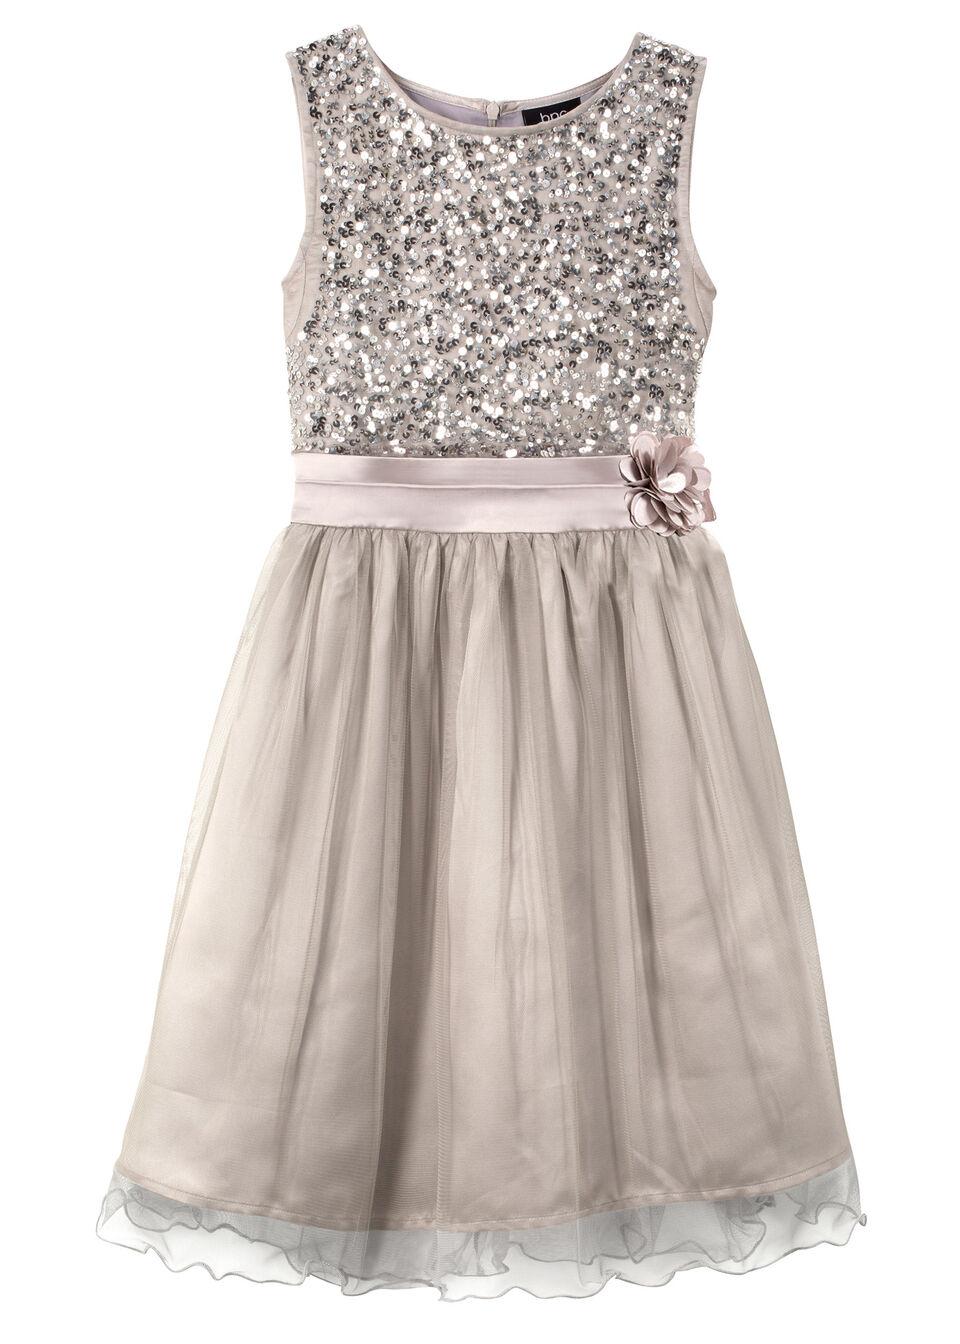 Sukienka na uroczyste okazje bonprix srebrny kolor